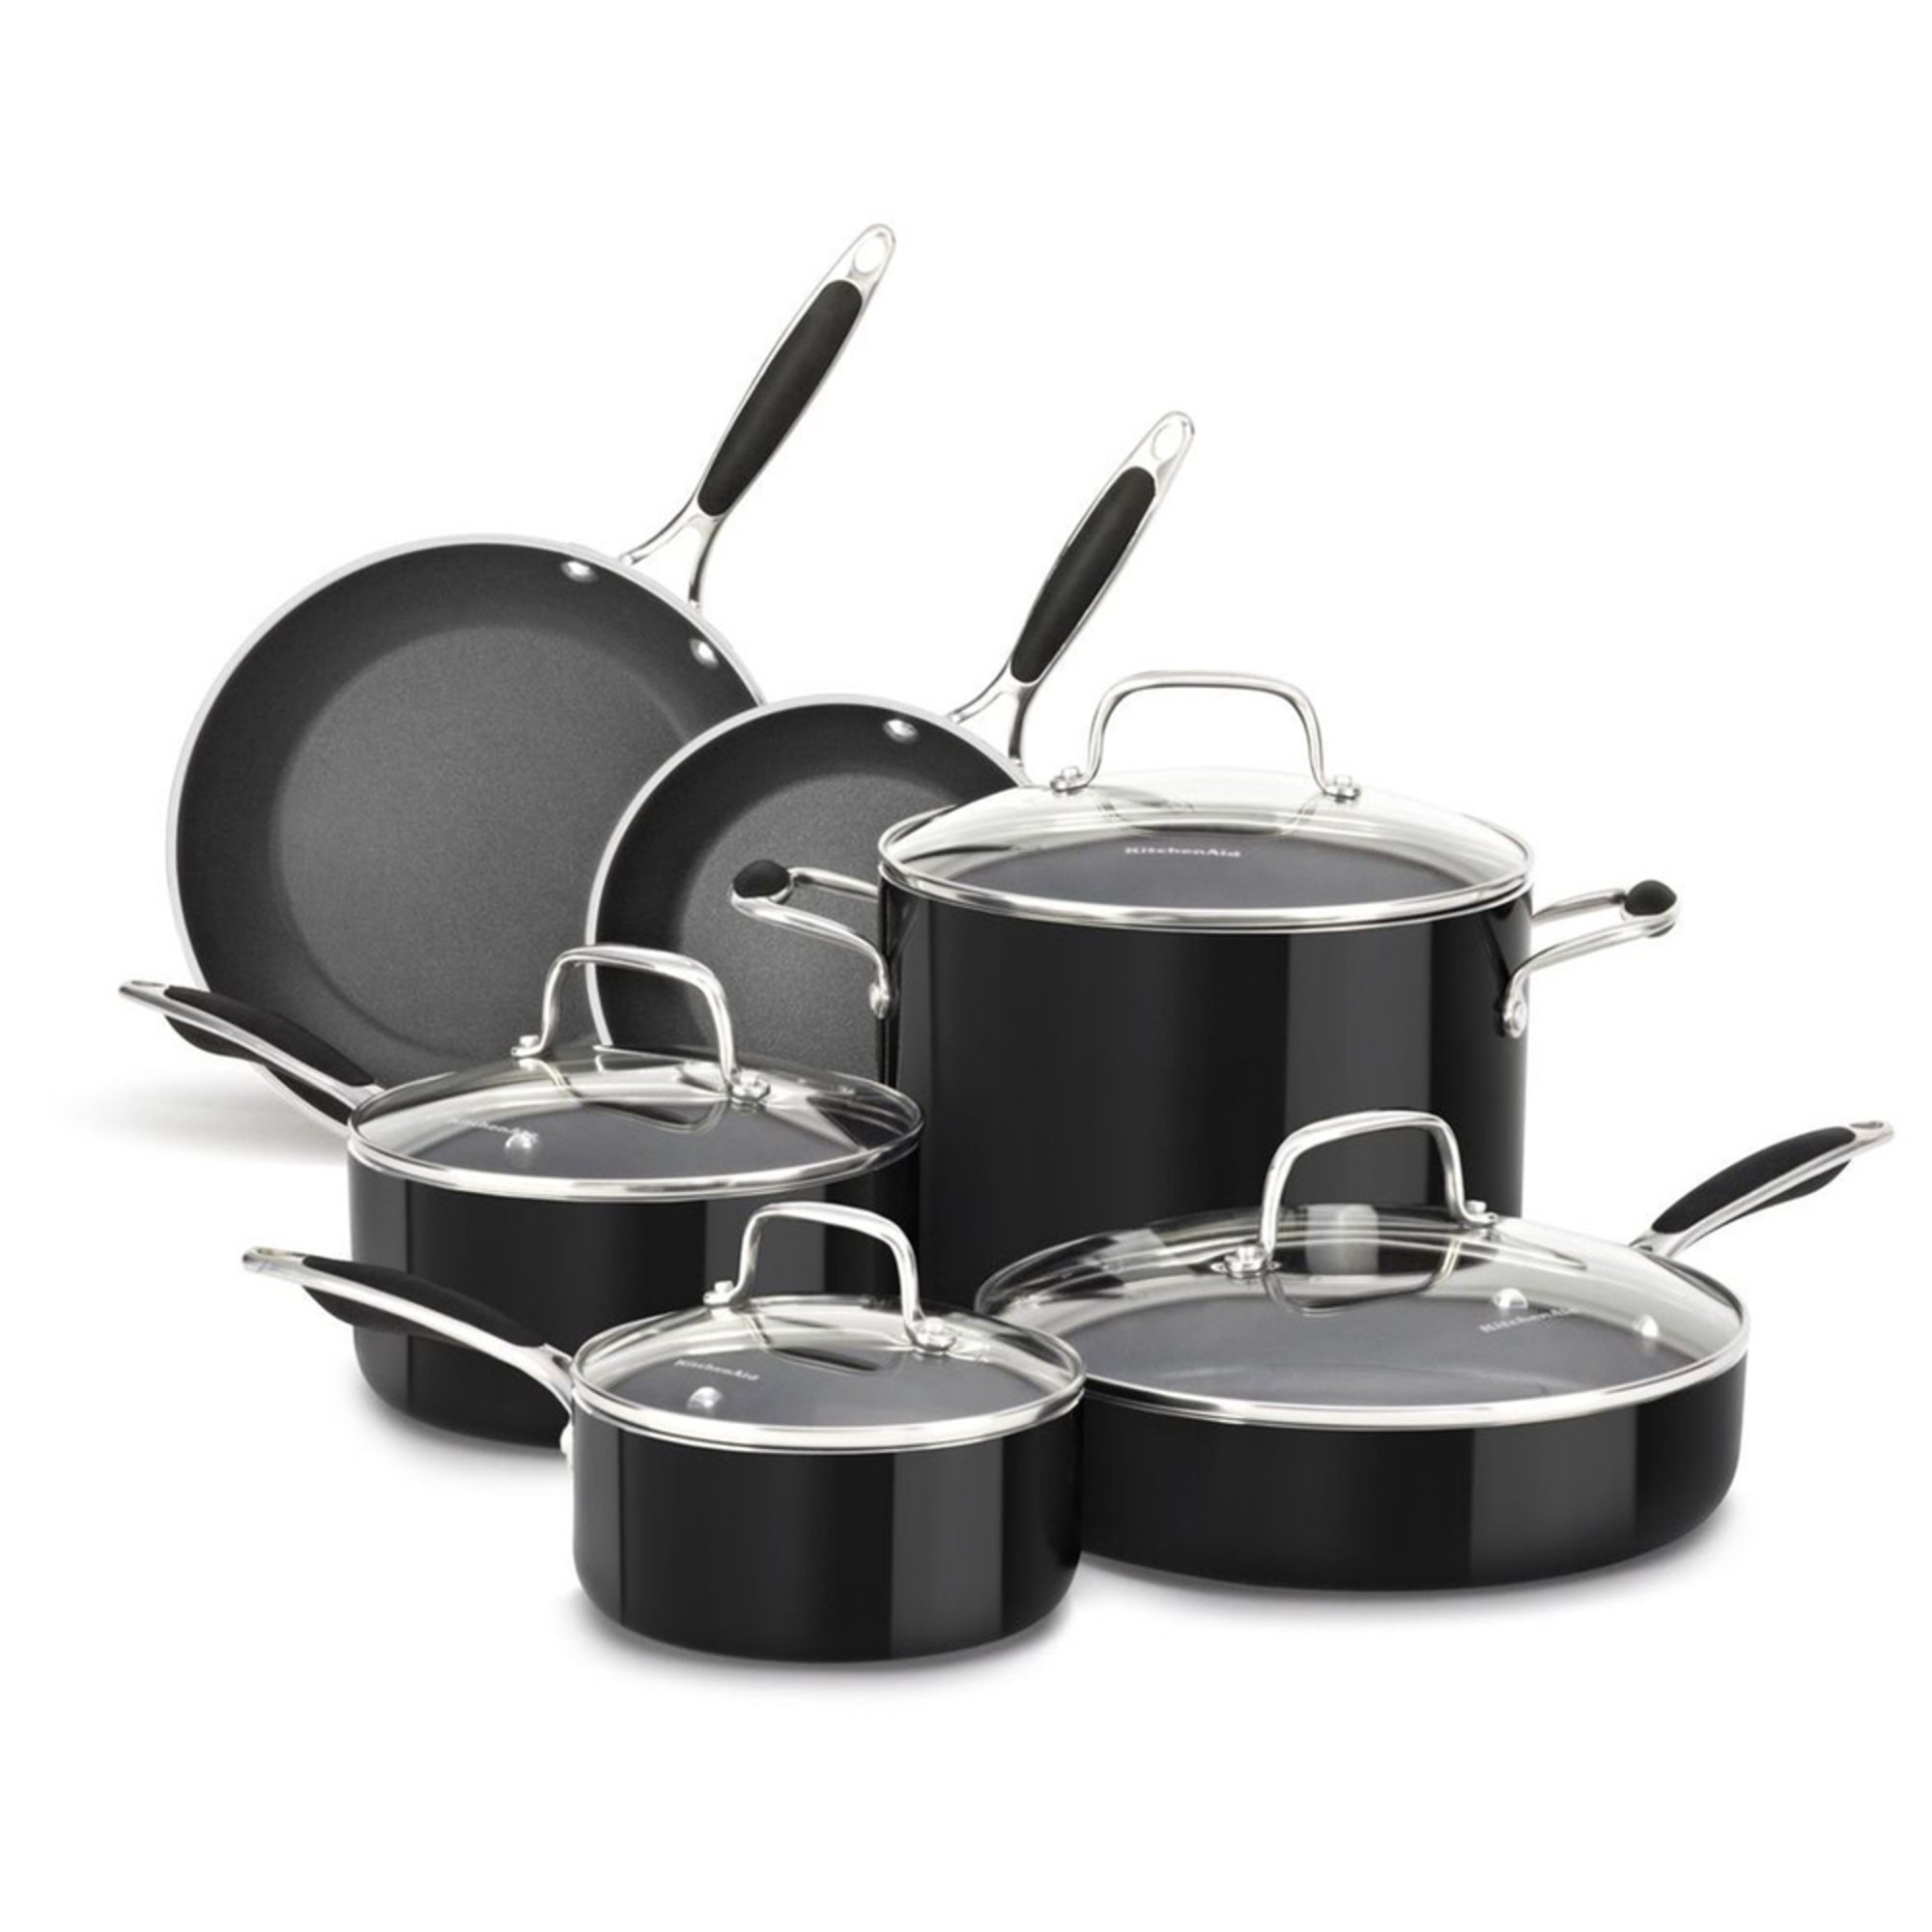 Kitchenaid Aluminum 10 Piece Cookware Set Onyx Black